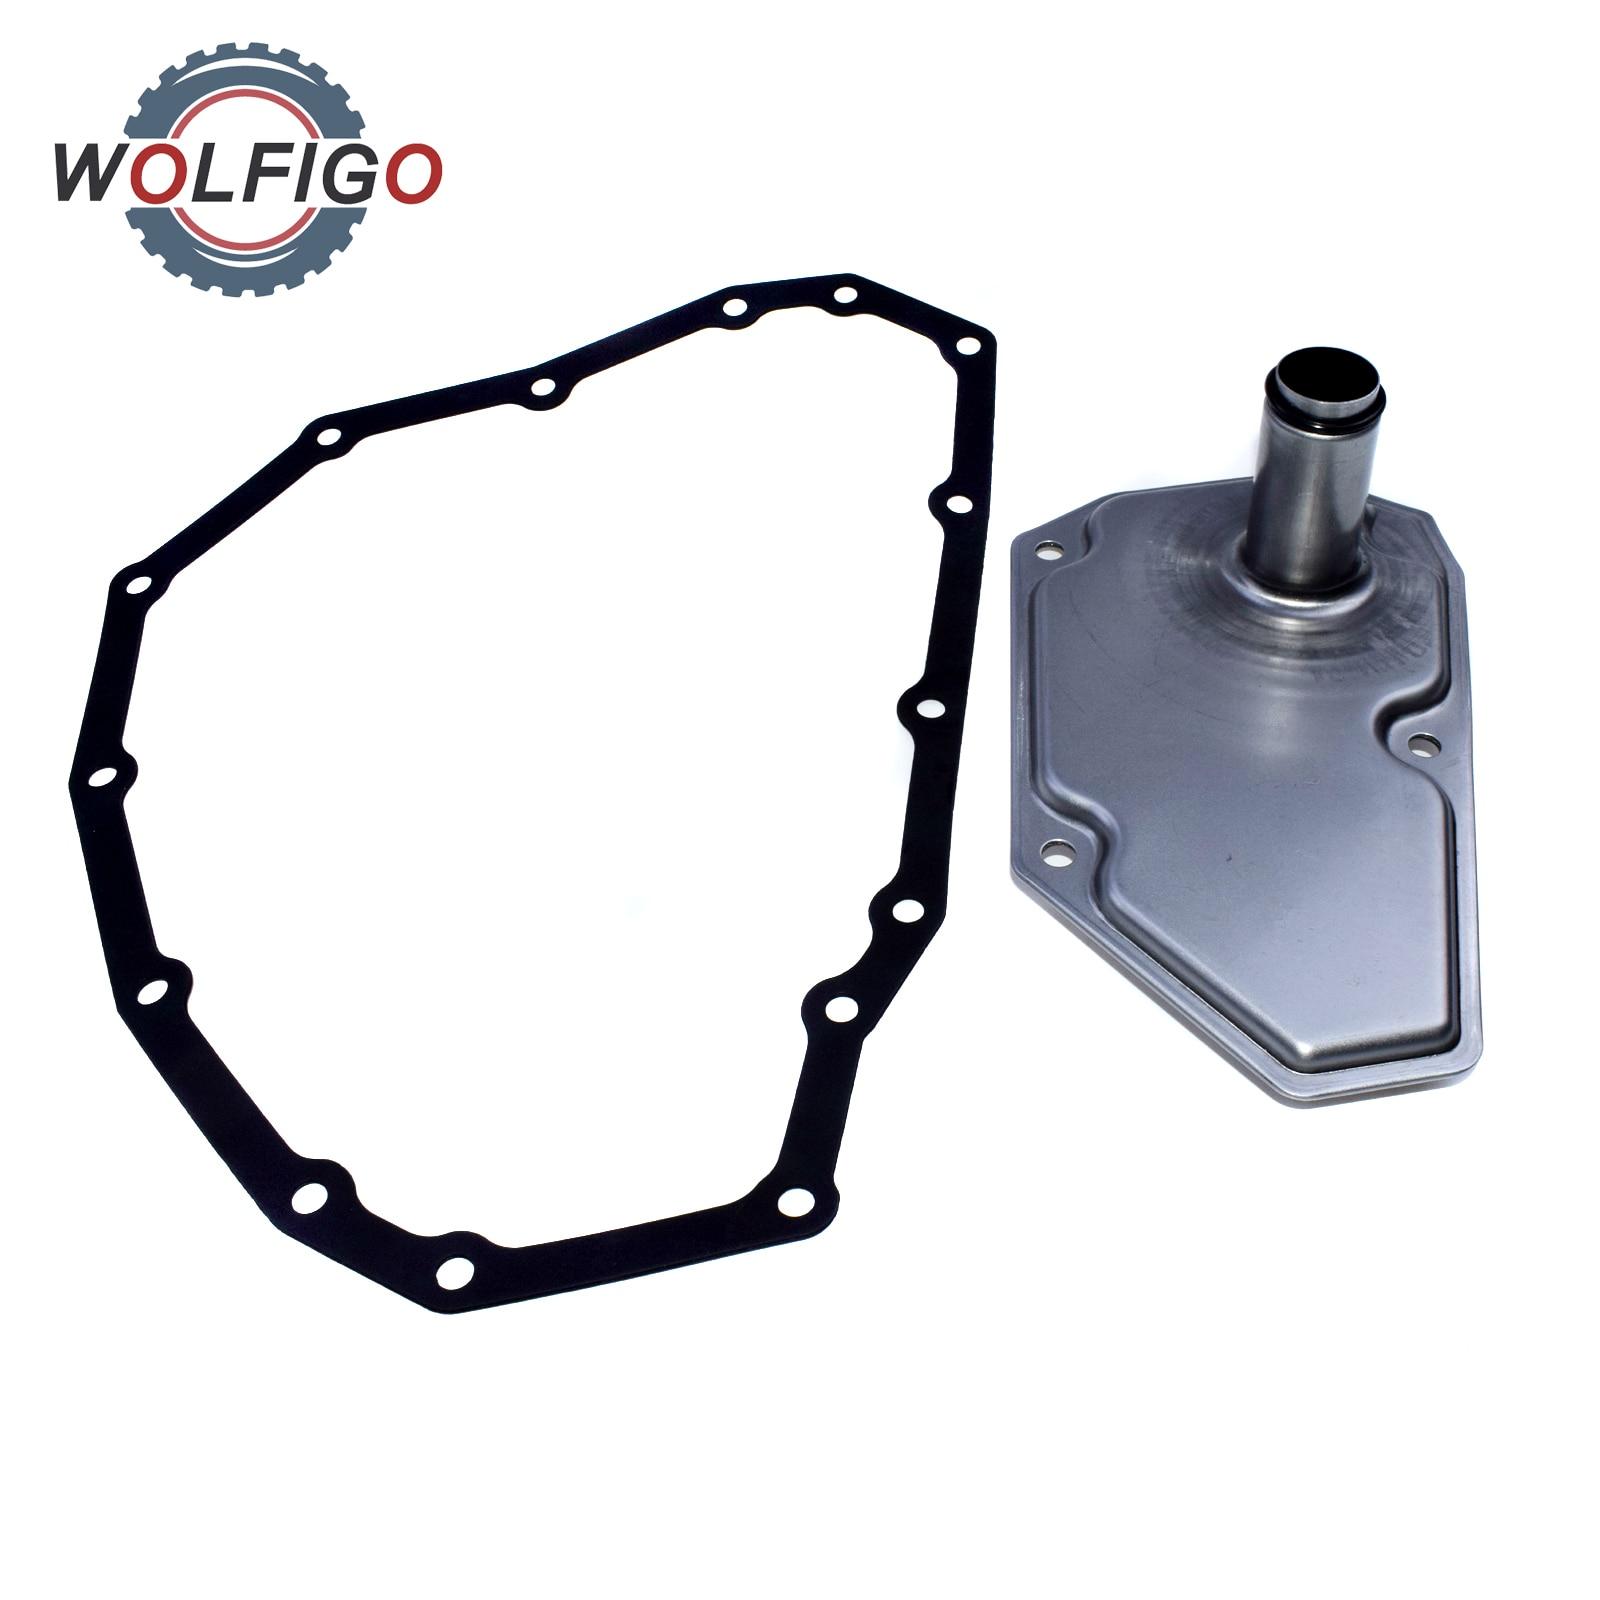 WOLFIGO RE0F11A JF015E Oil Filter and Pan Gasket for Nissan Mitsubishi Suzuki 33010-JF015 31728-3JX0C 31728-3XX0B 31397-3JX0A